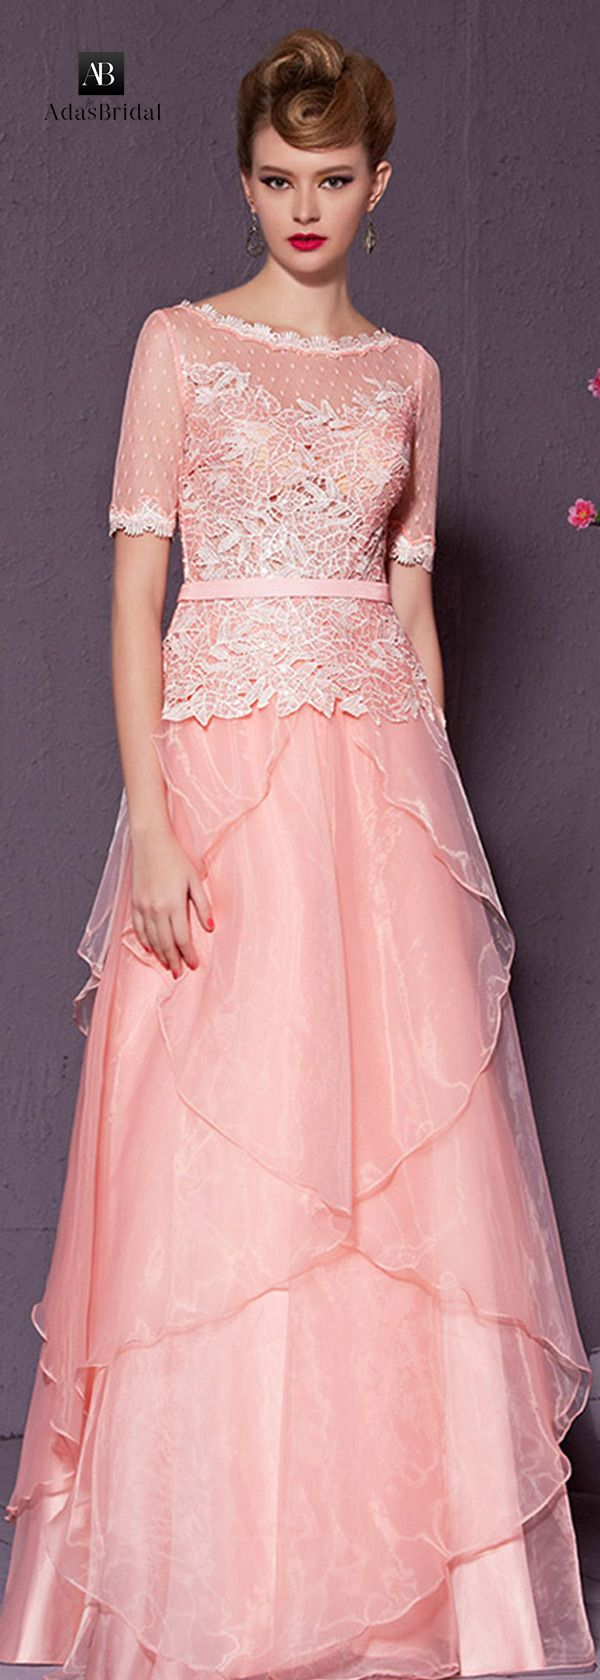 Fantástico Prom Vestidos Fayetteville Nc Ideas Ornamento Elaboración ...